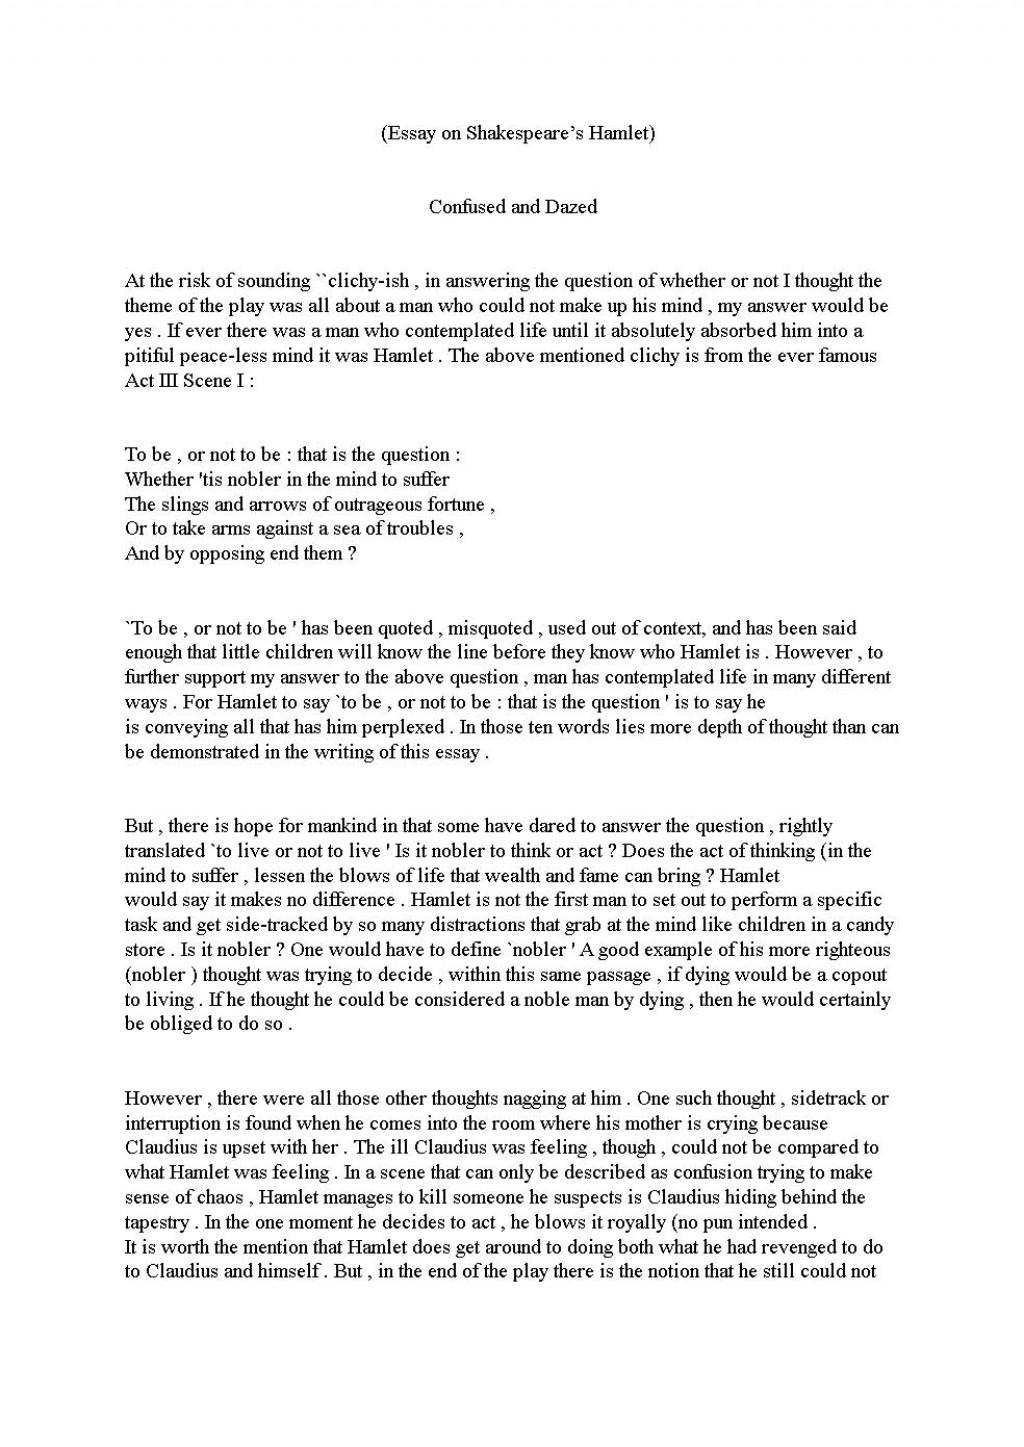 007 Drama Essay Sample Childhood Memory Top Ideas Earliest My Memories Example Large